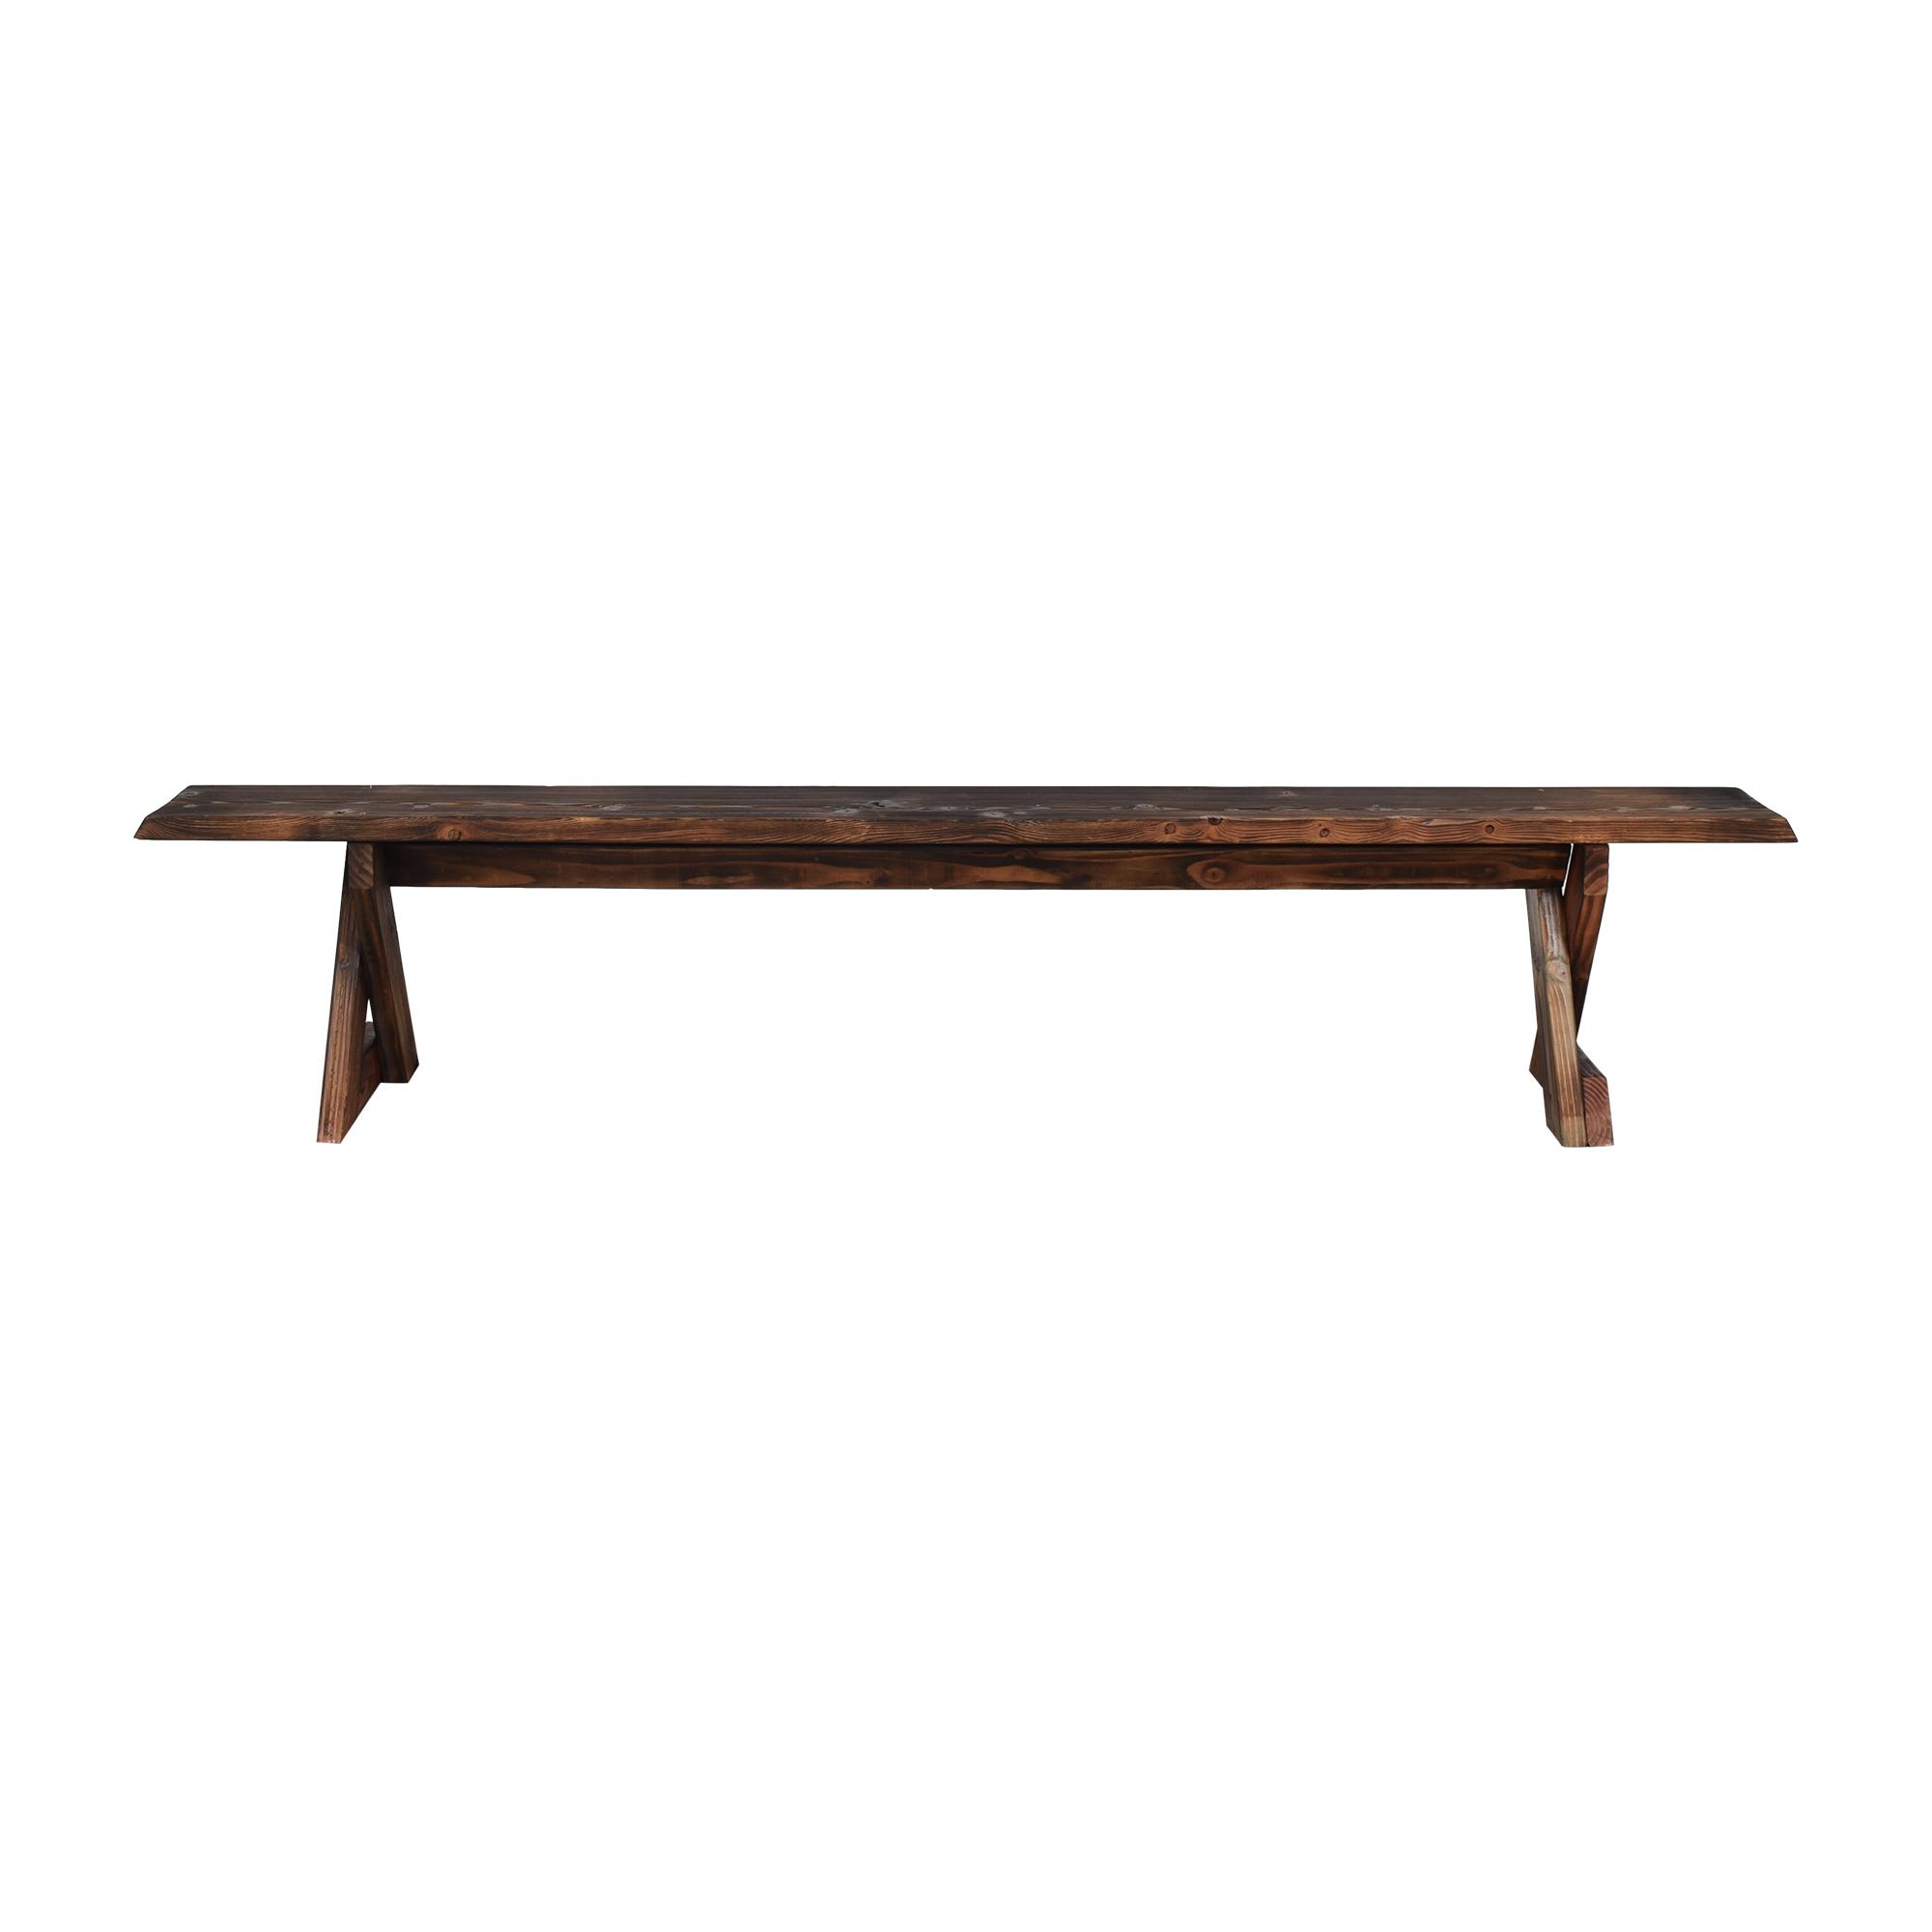 Shou Sugi Ban Style Bench nj